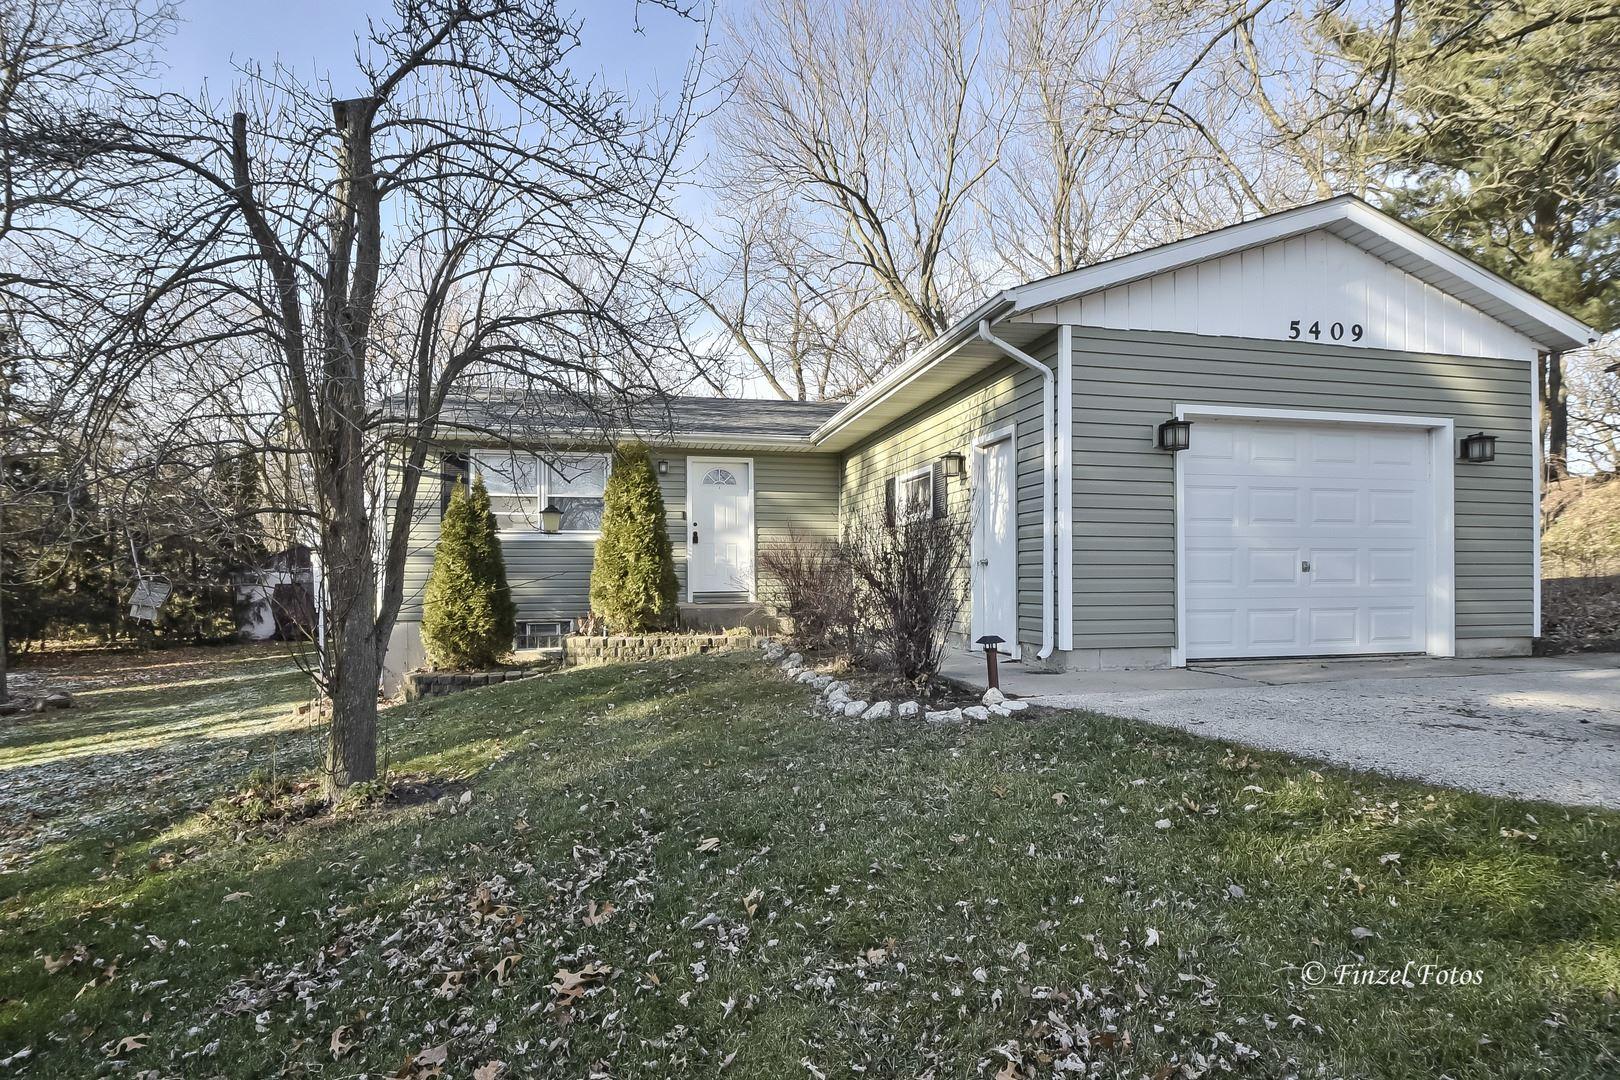 5409 Summerville Avenue, Wonder Lake, IL 60097 - #: 10956377